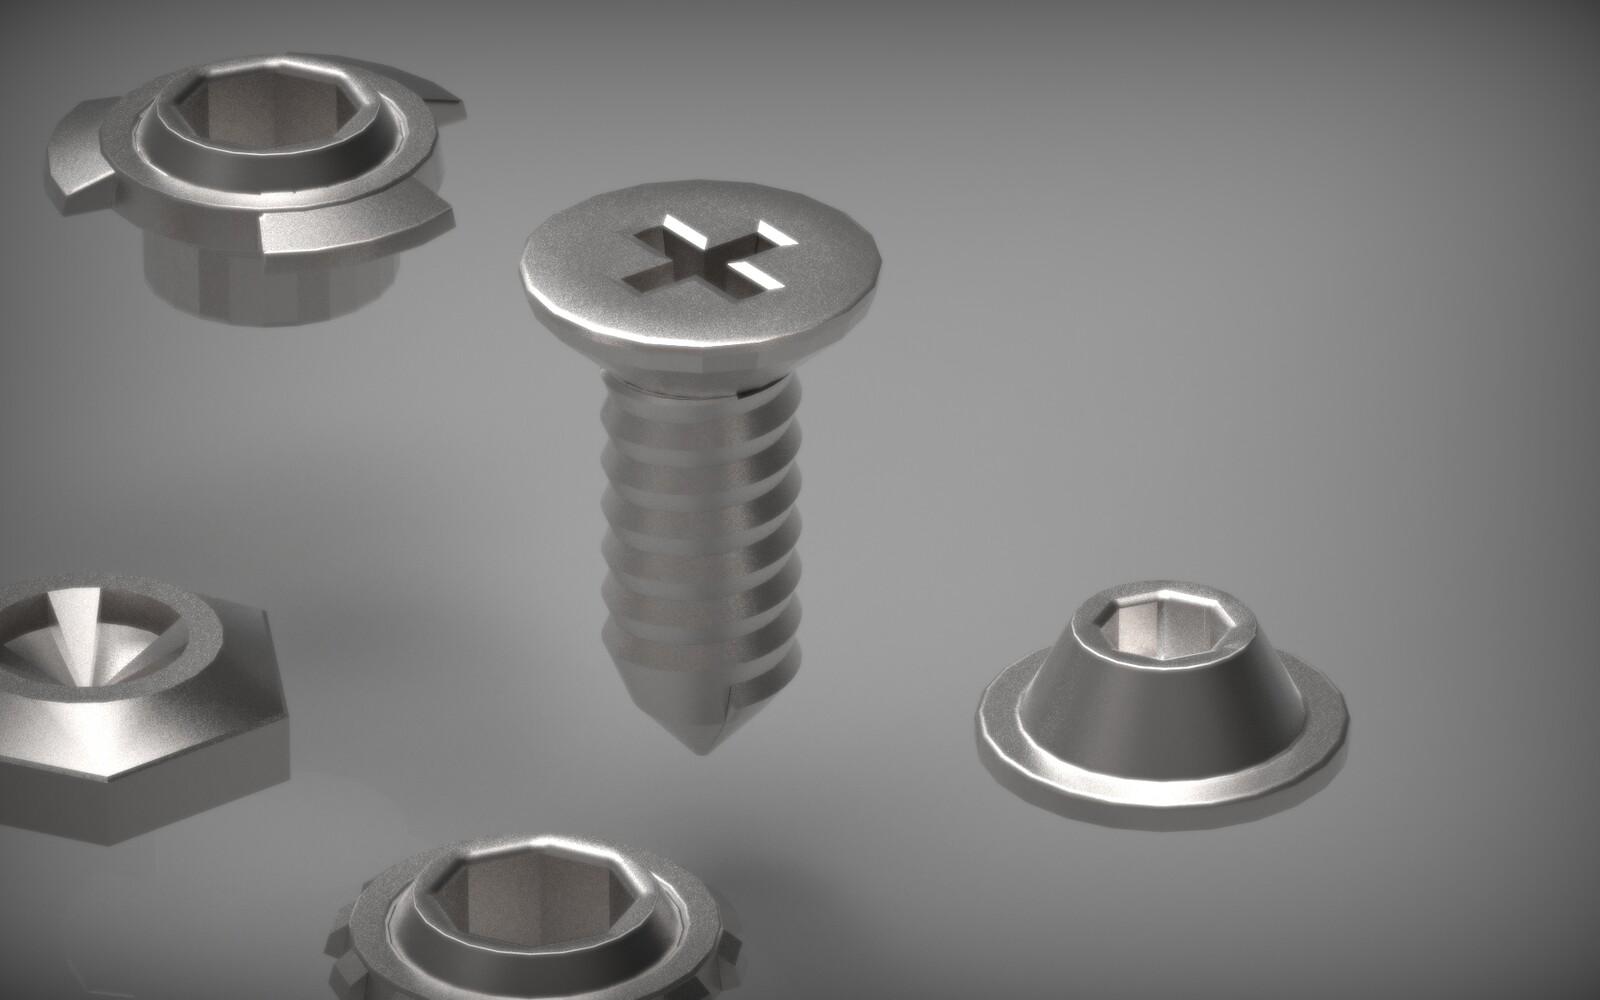 Design and Kit bashit!